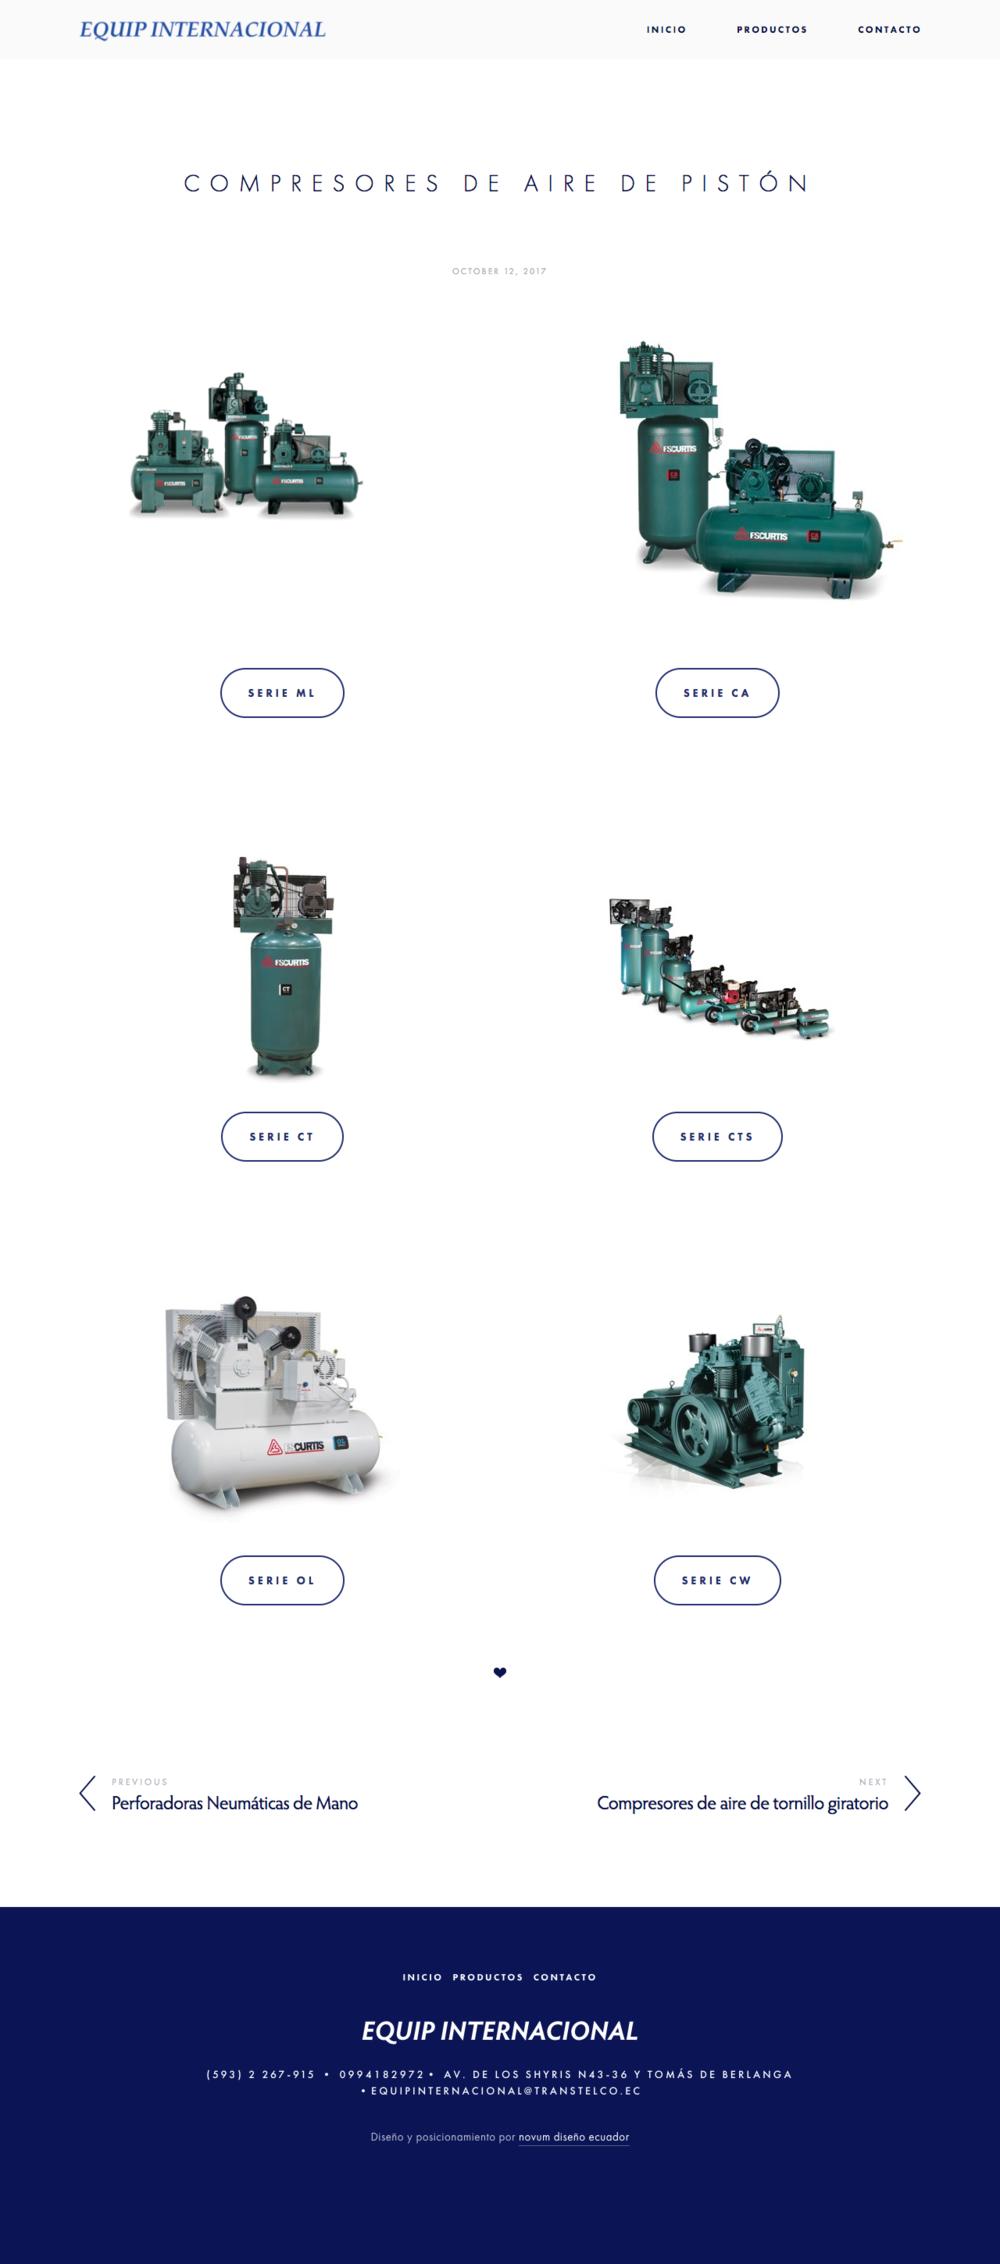 screencapture-equipinternacional-productos-1-2017-9-5-compresores-de-aire-de-pistn-gw9sj-1508184141636.png